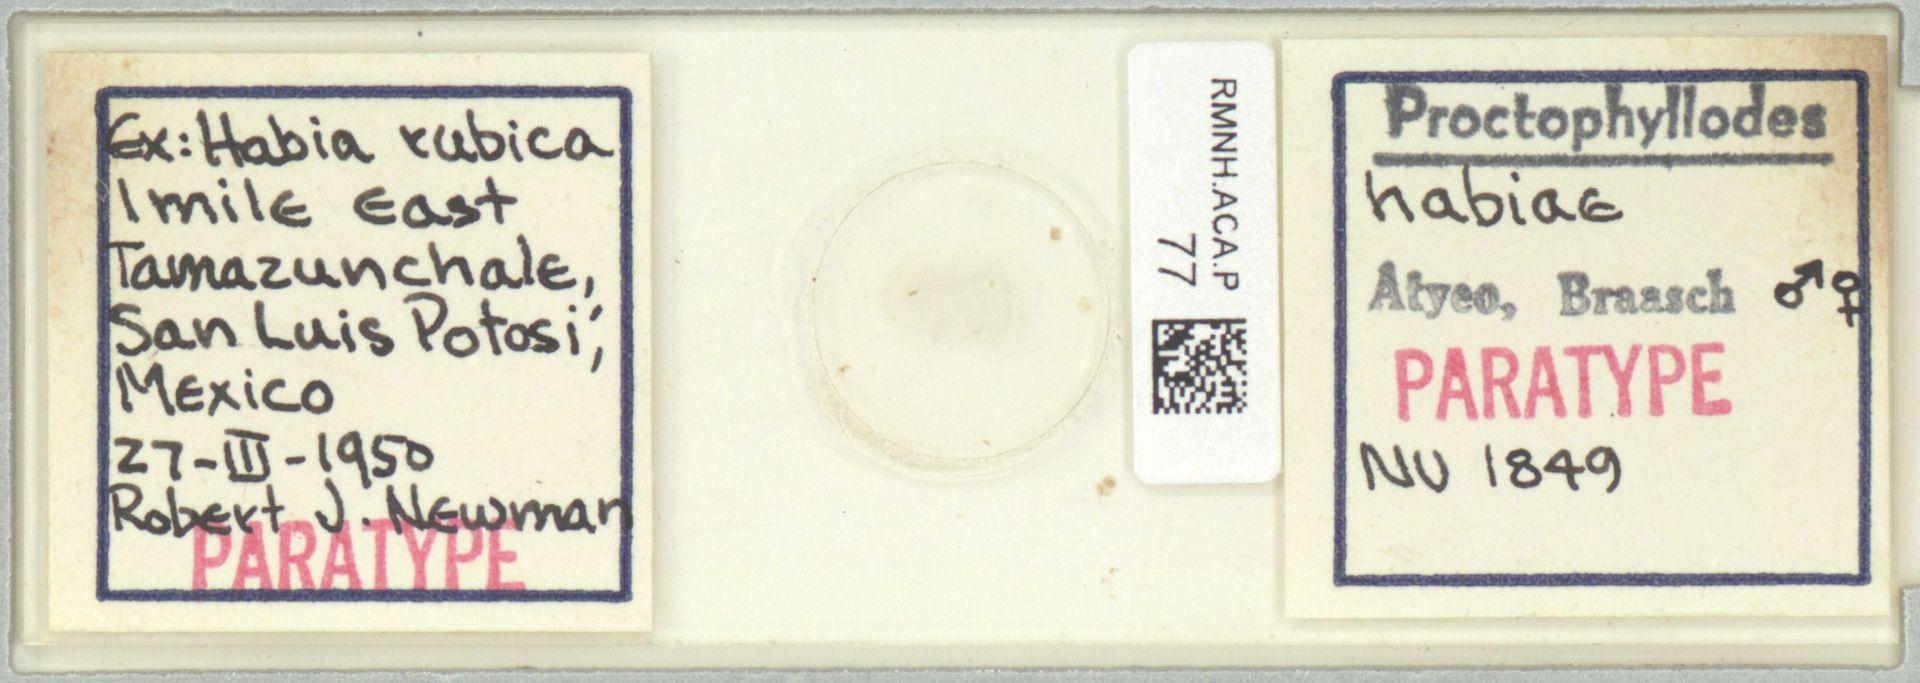 RMNH.ACA.P.77 | Proctophyllodes habiae Atyeo, Braash